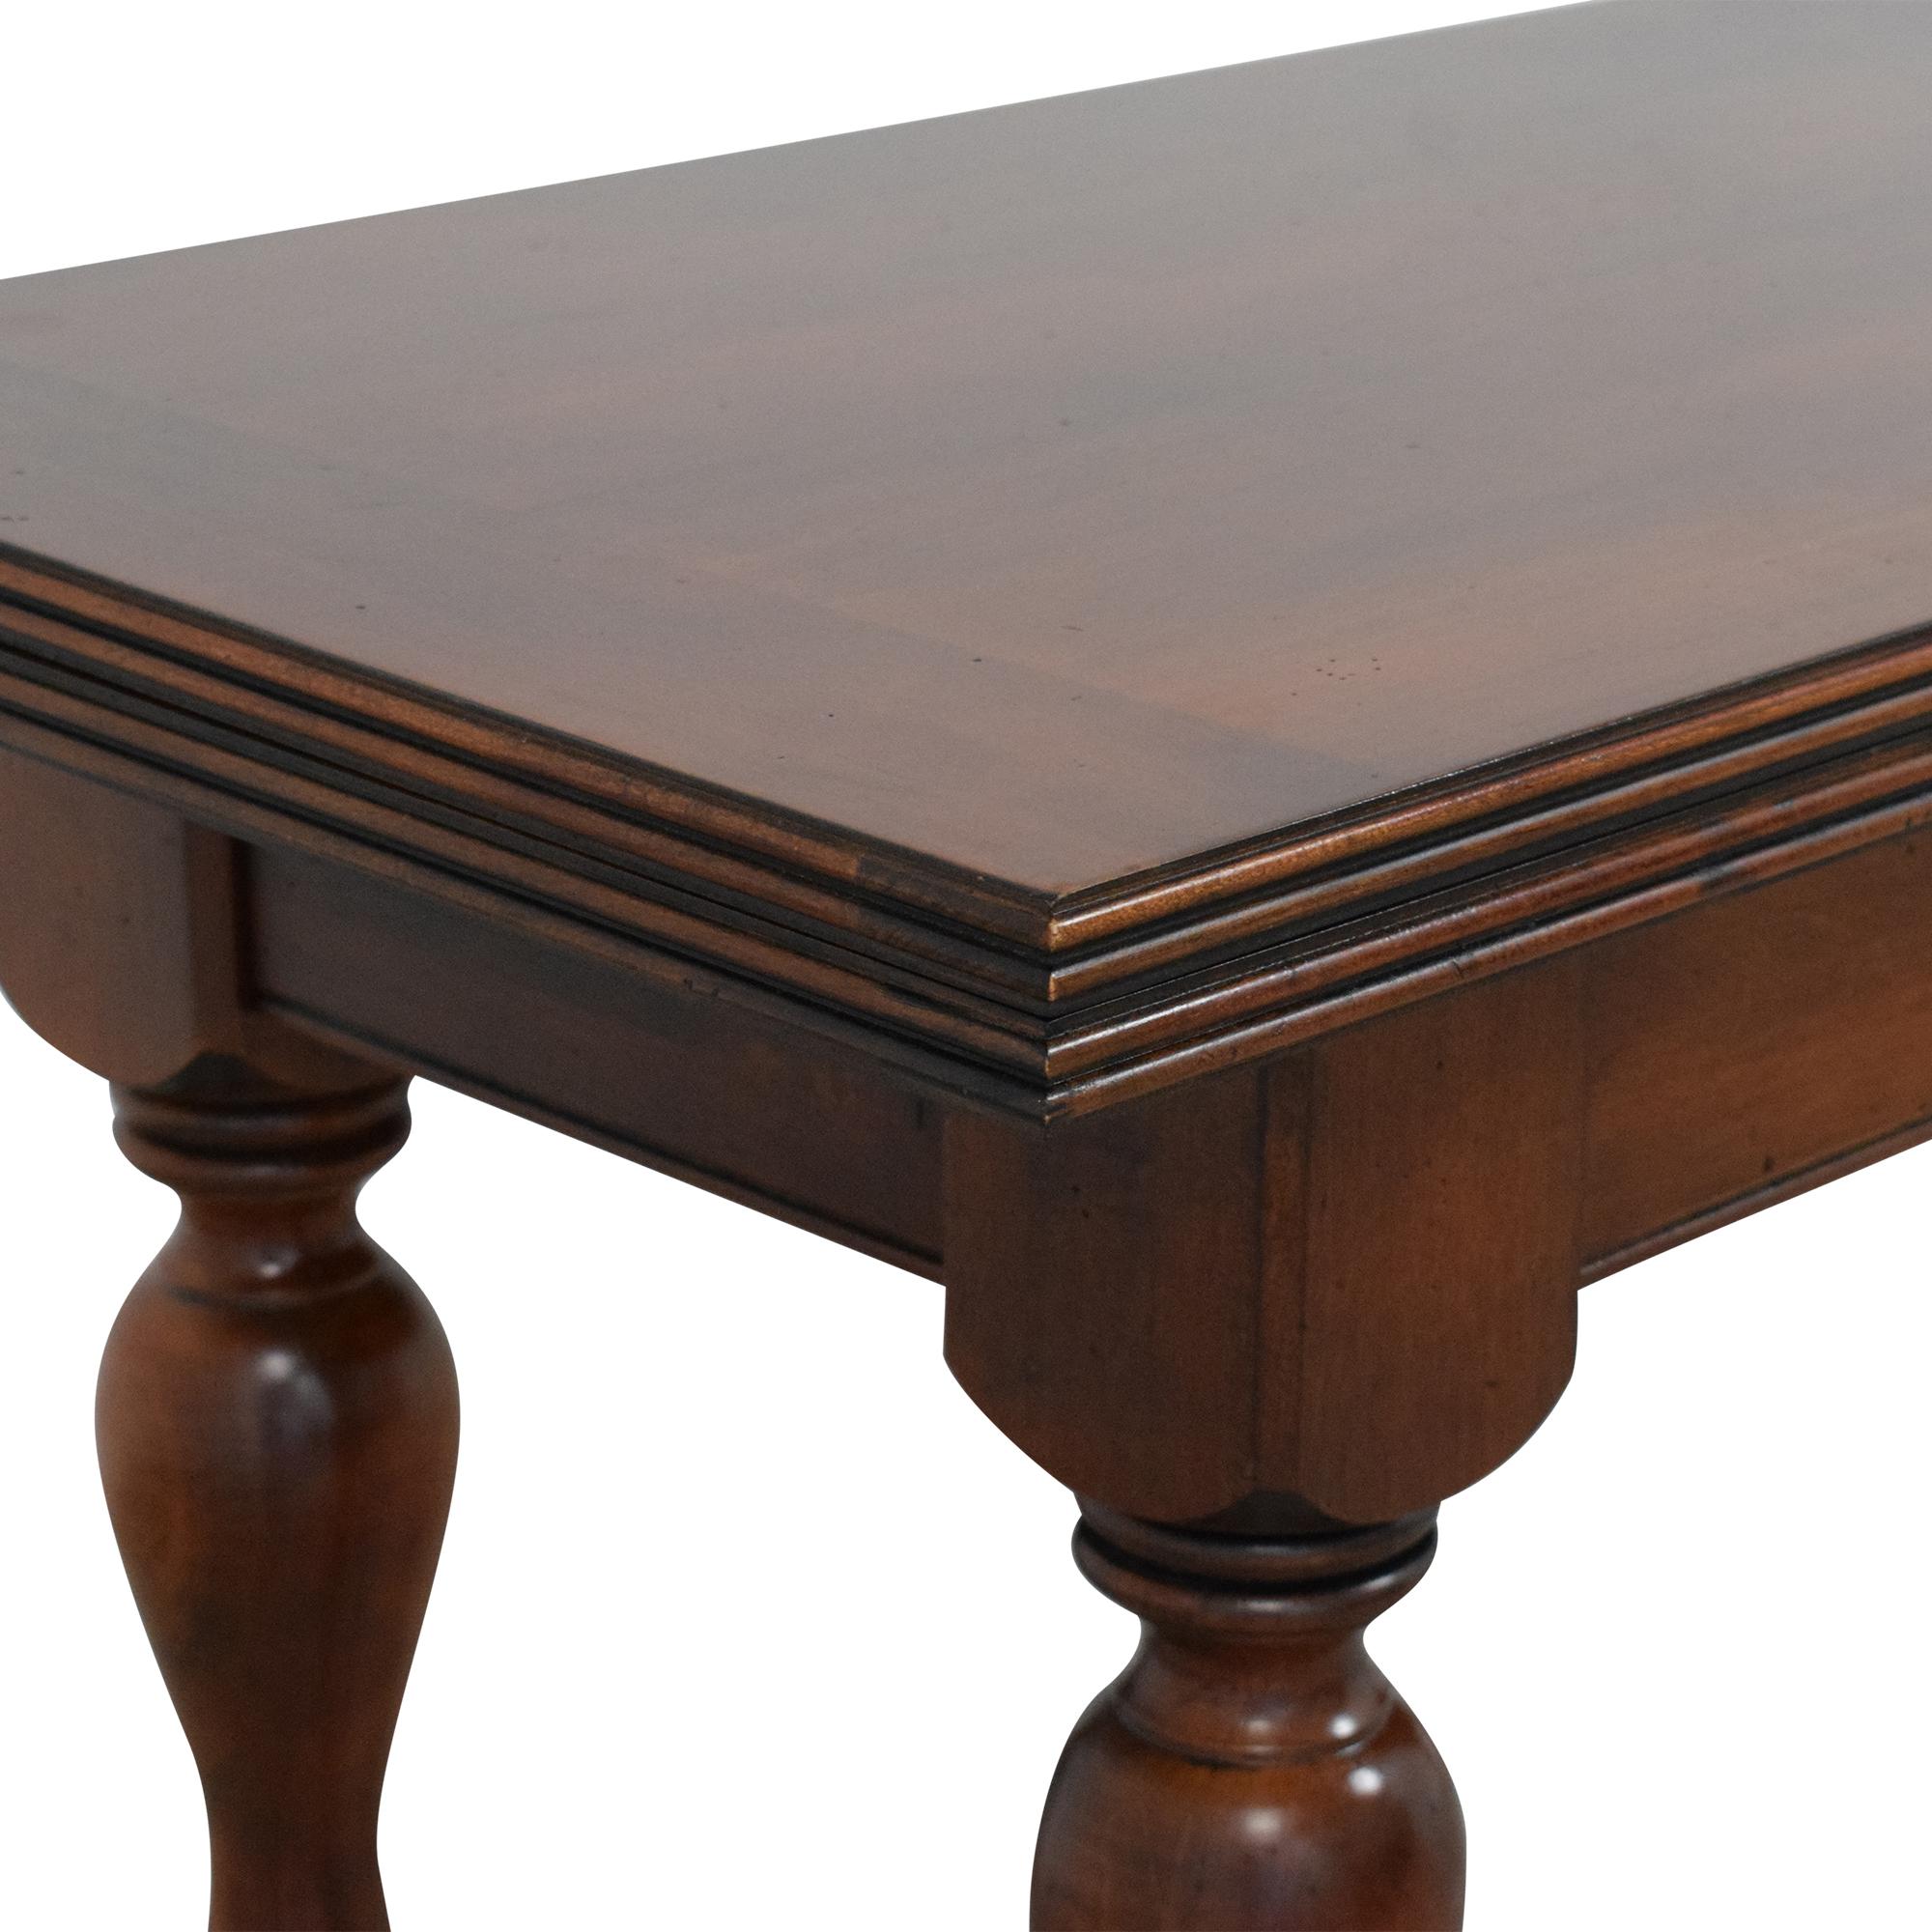 Ethan Allen Ethan Allen British Classics Expandable Console Table price